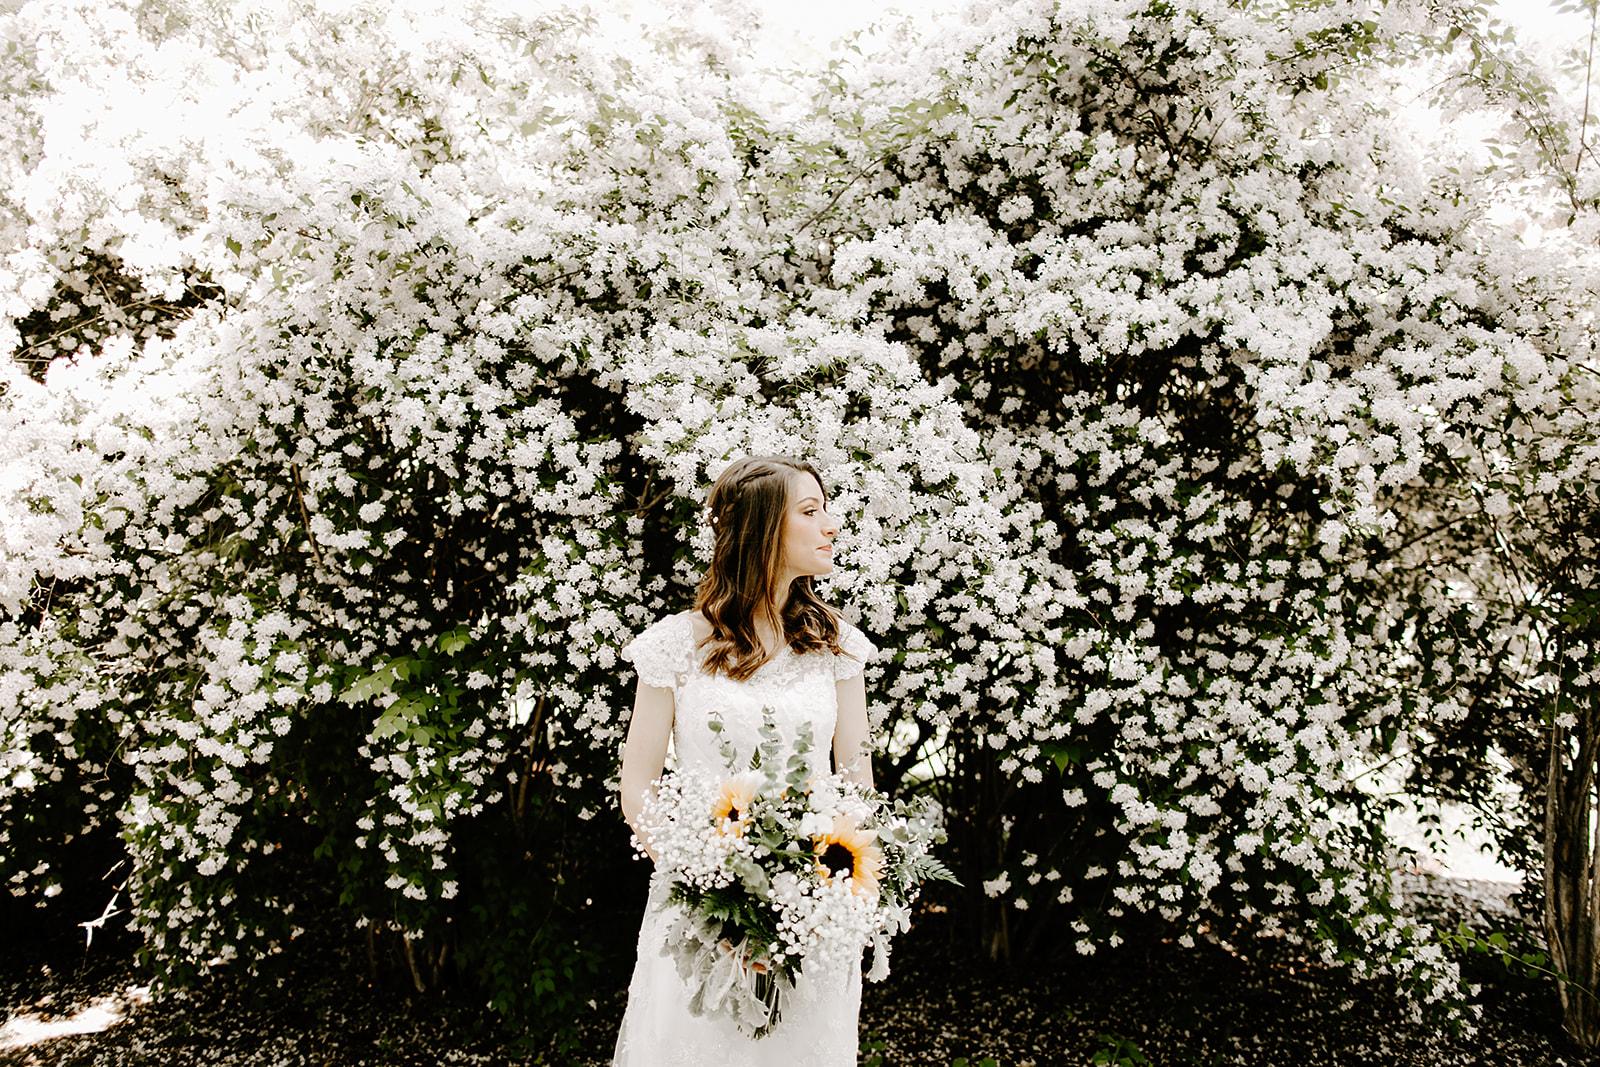 Lily and Easton Wedding Carmel Indiana Cool Creek Park Grace Church Emily Elyse Wehner Photography -214.jpg